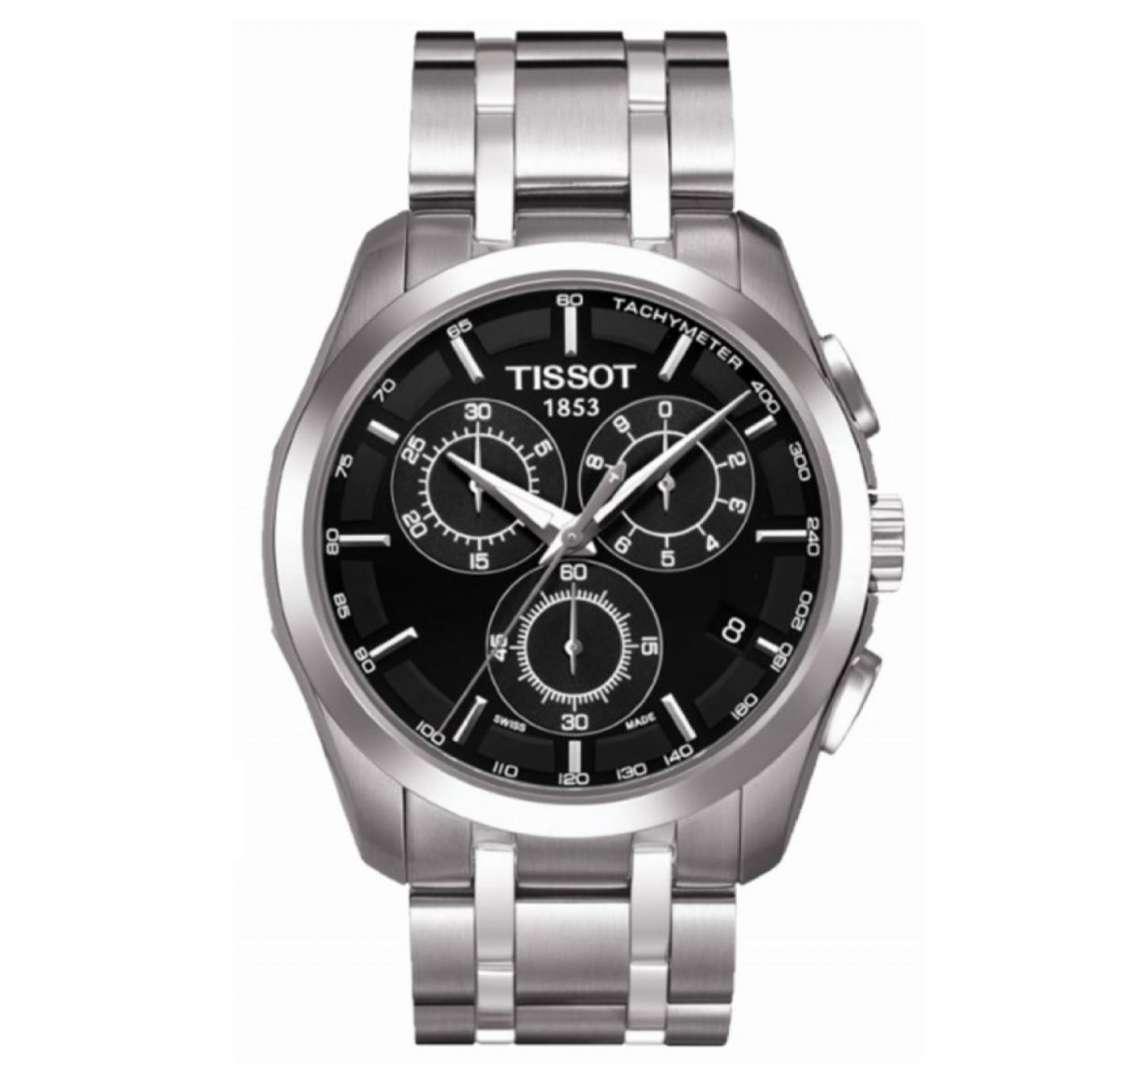 שעון יד אנלוגי tissot t035.617.11.051.00 טיסו